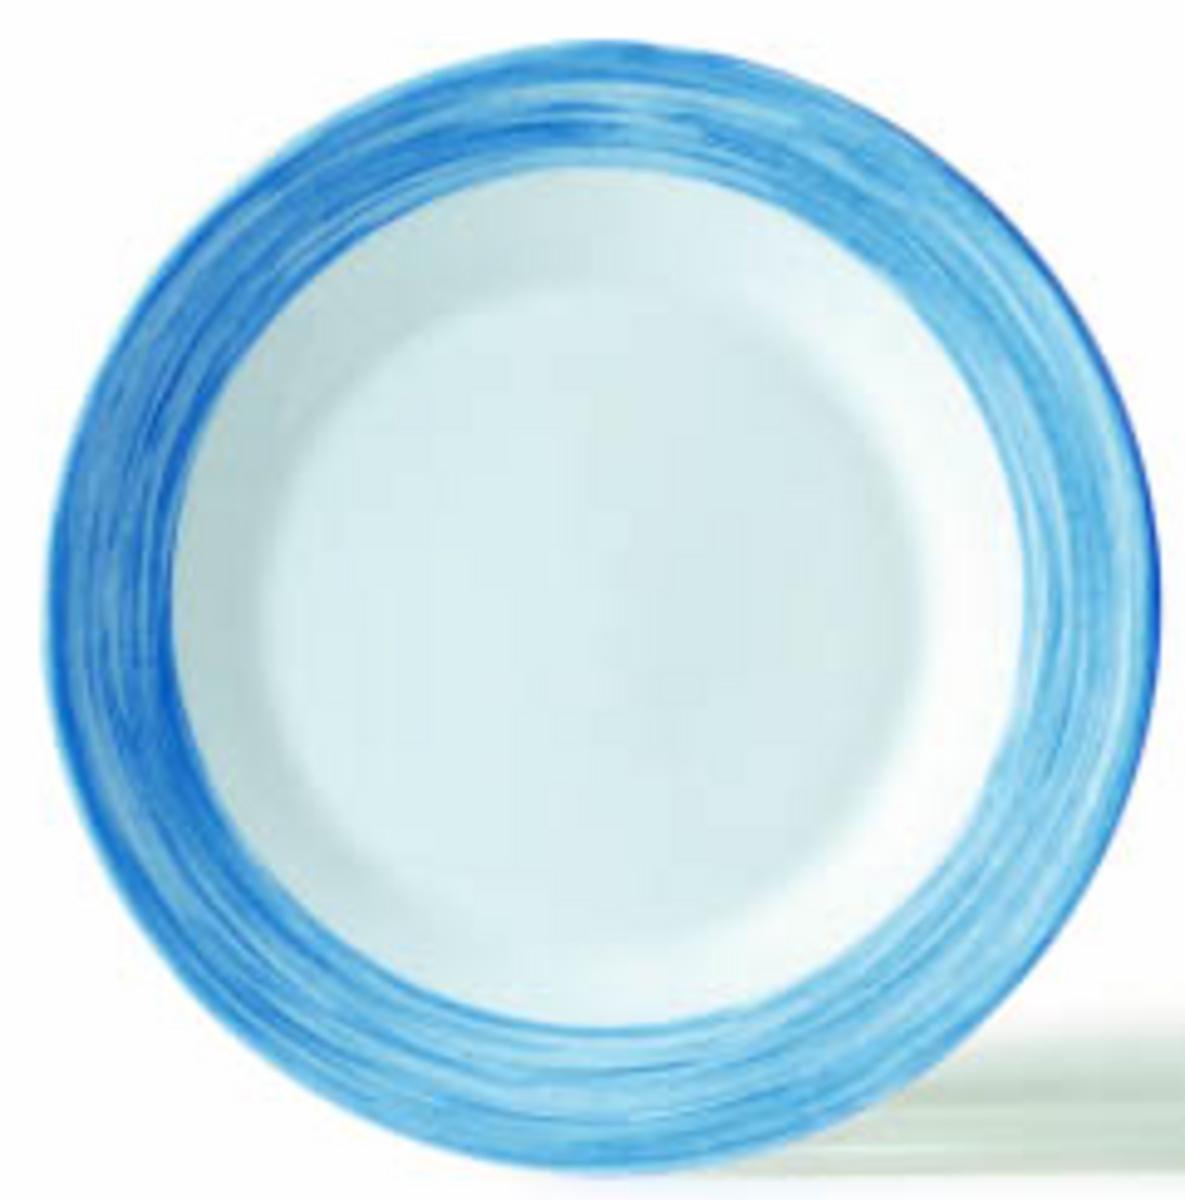 Assiette creuse ronde blue jean verre Ø 22,50 cm Brush Arcoroc